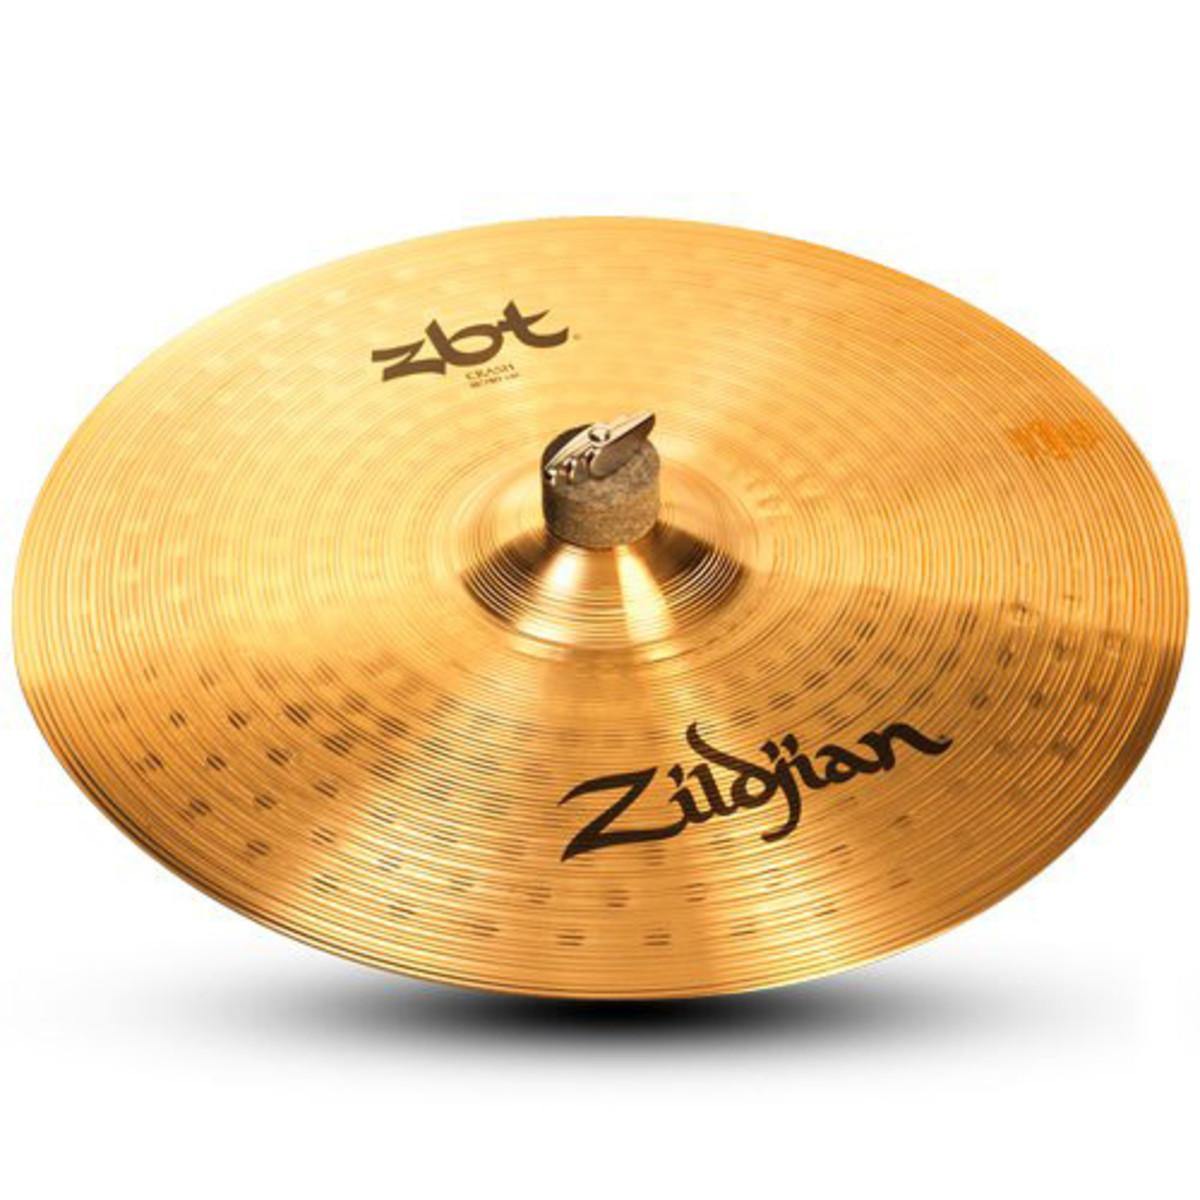 zildjian zbt 19 39 39 crash cymbal at gear4music. Black Bedroom Furniture Sets. Home Design Ideas